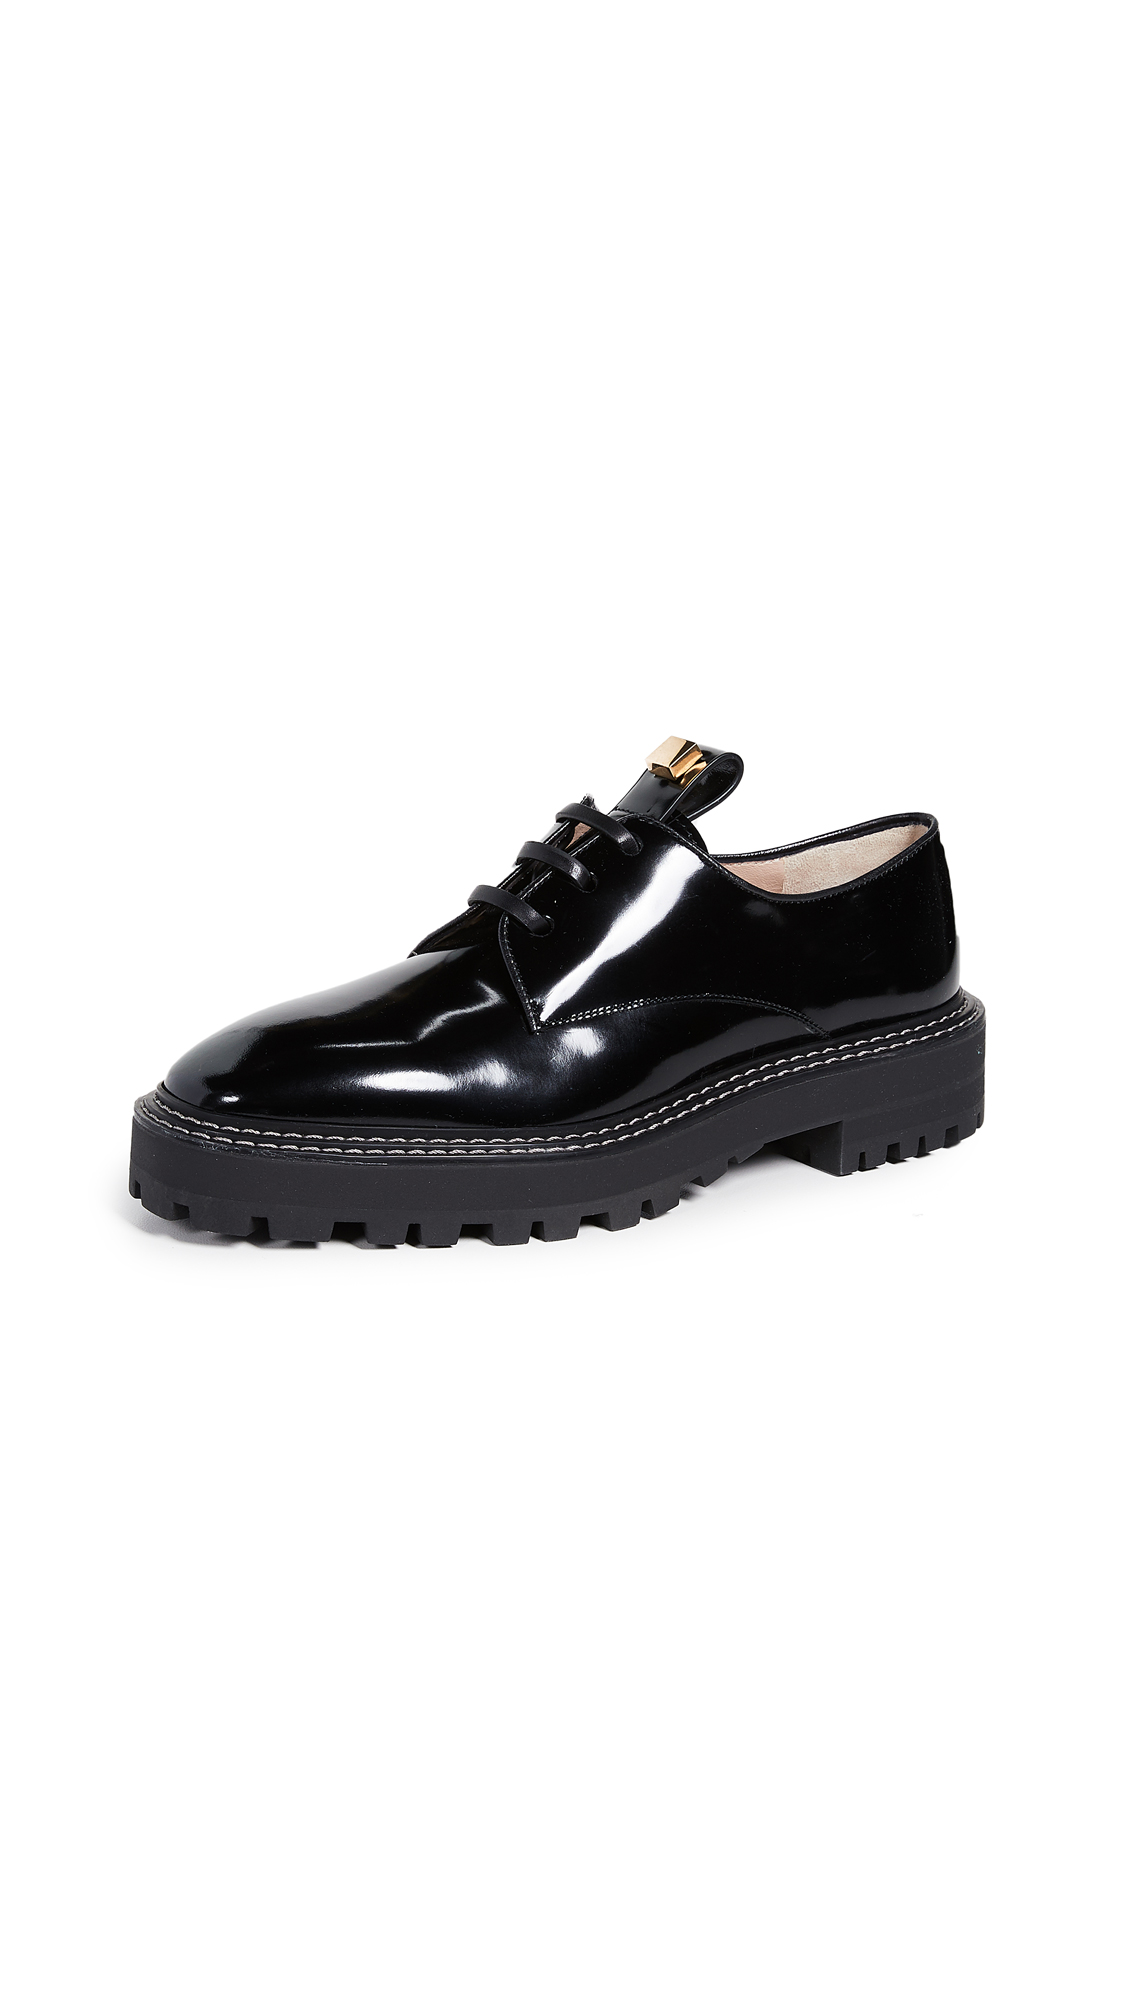 Stuart Weitzman Jesper Oxford Shoes - Pitch Black